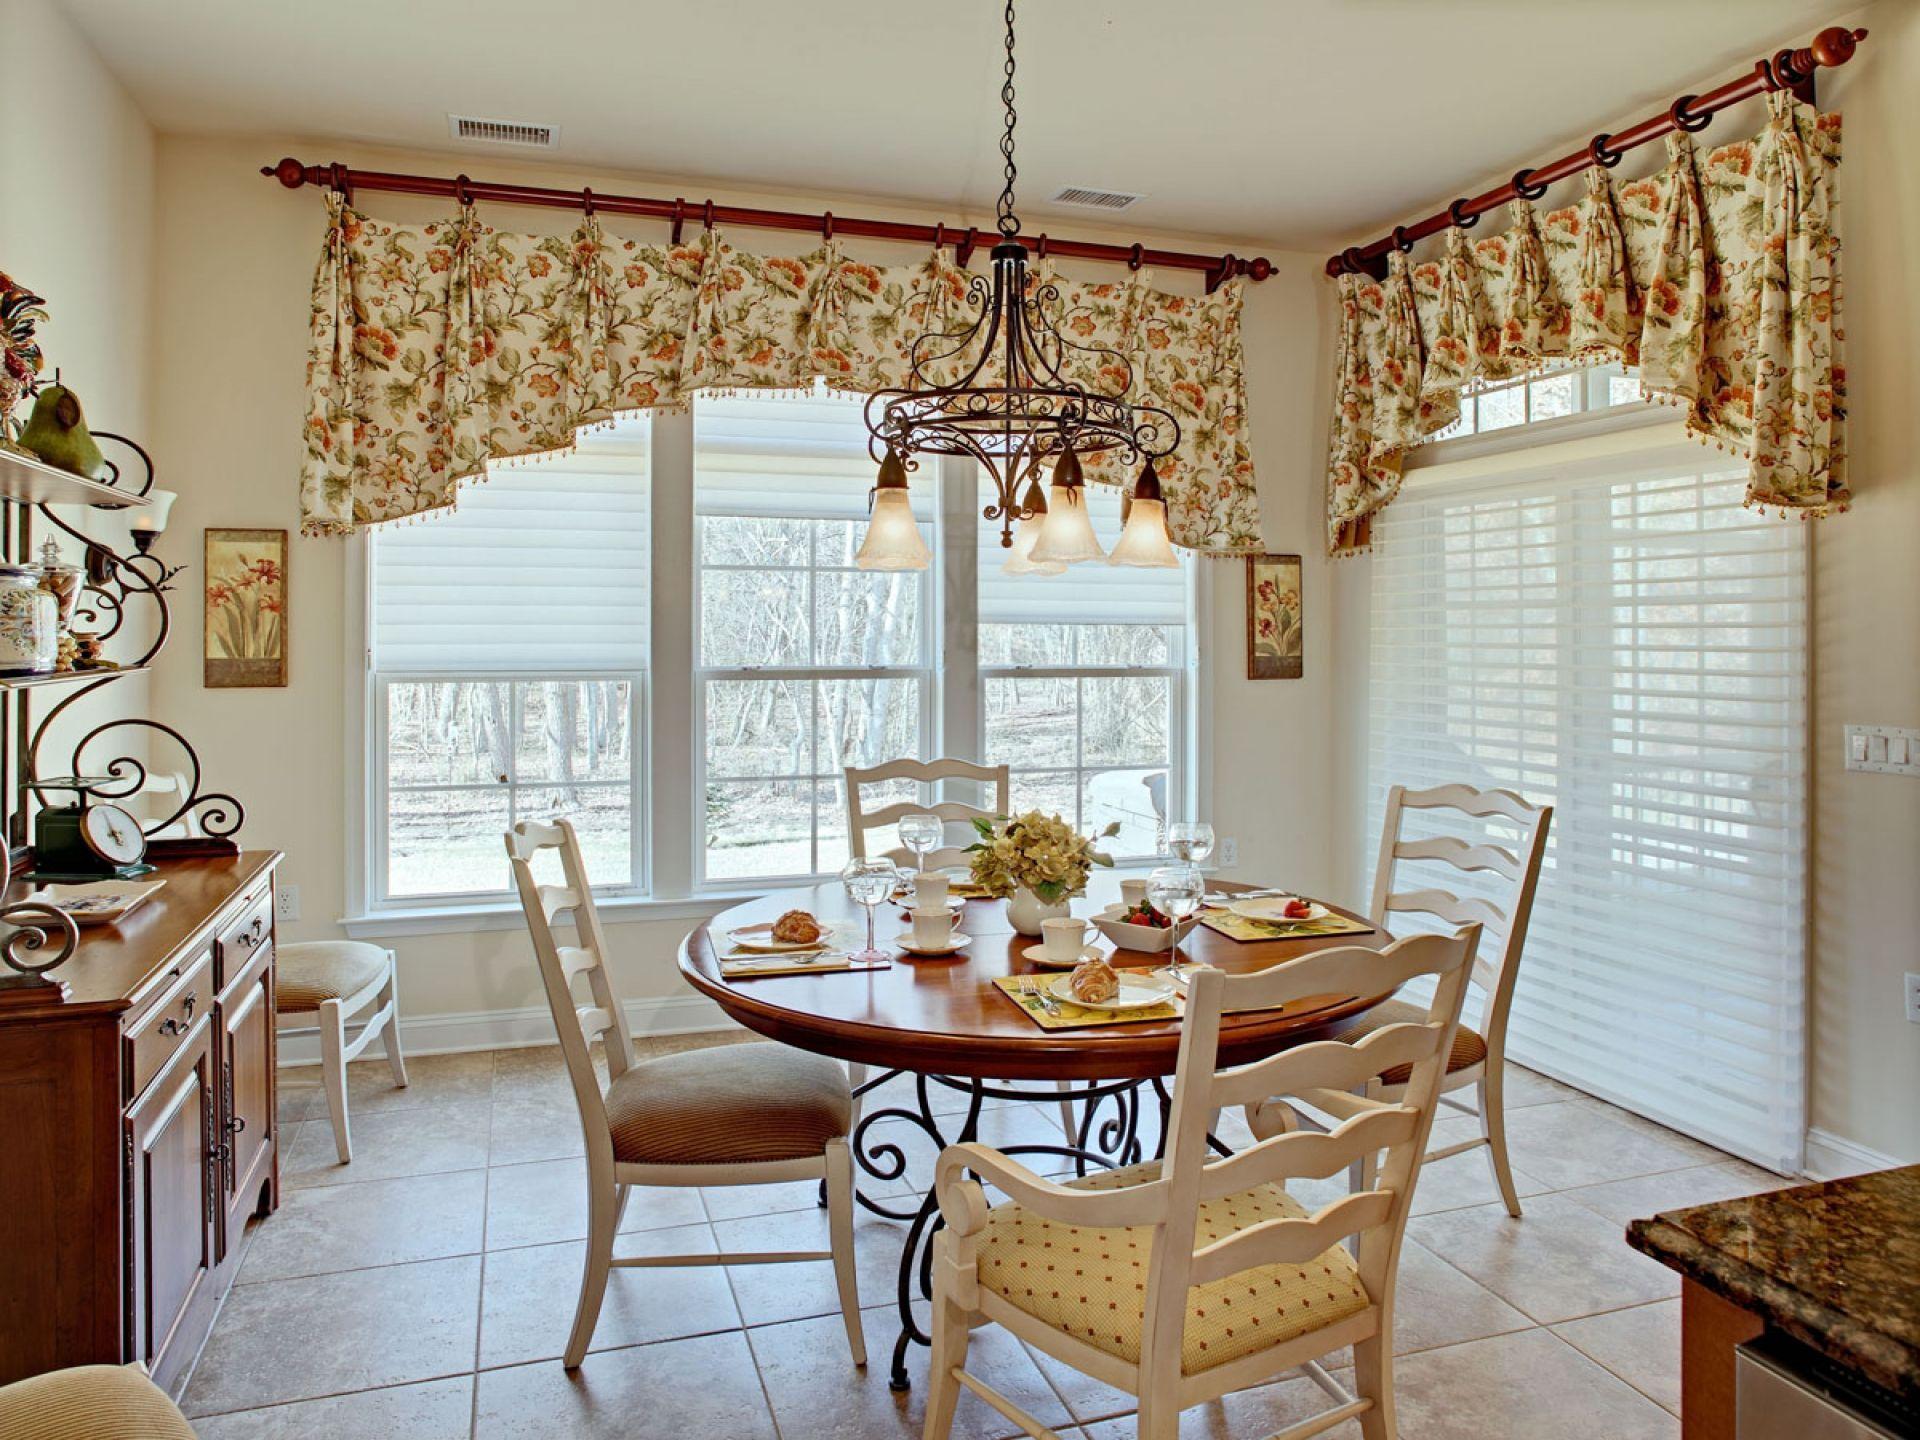 Kết quả hình ảnh cho country cottage dining room ideas interior